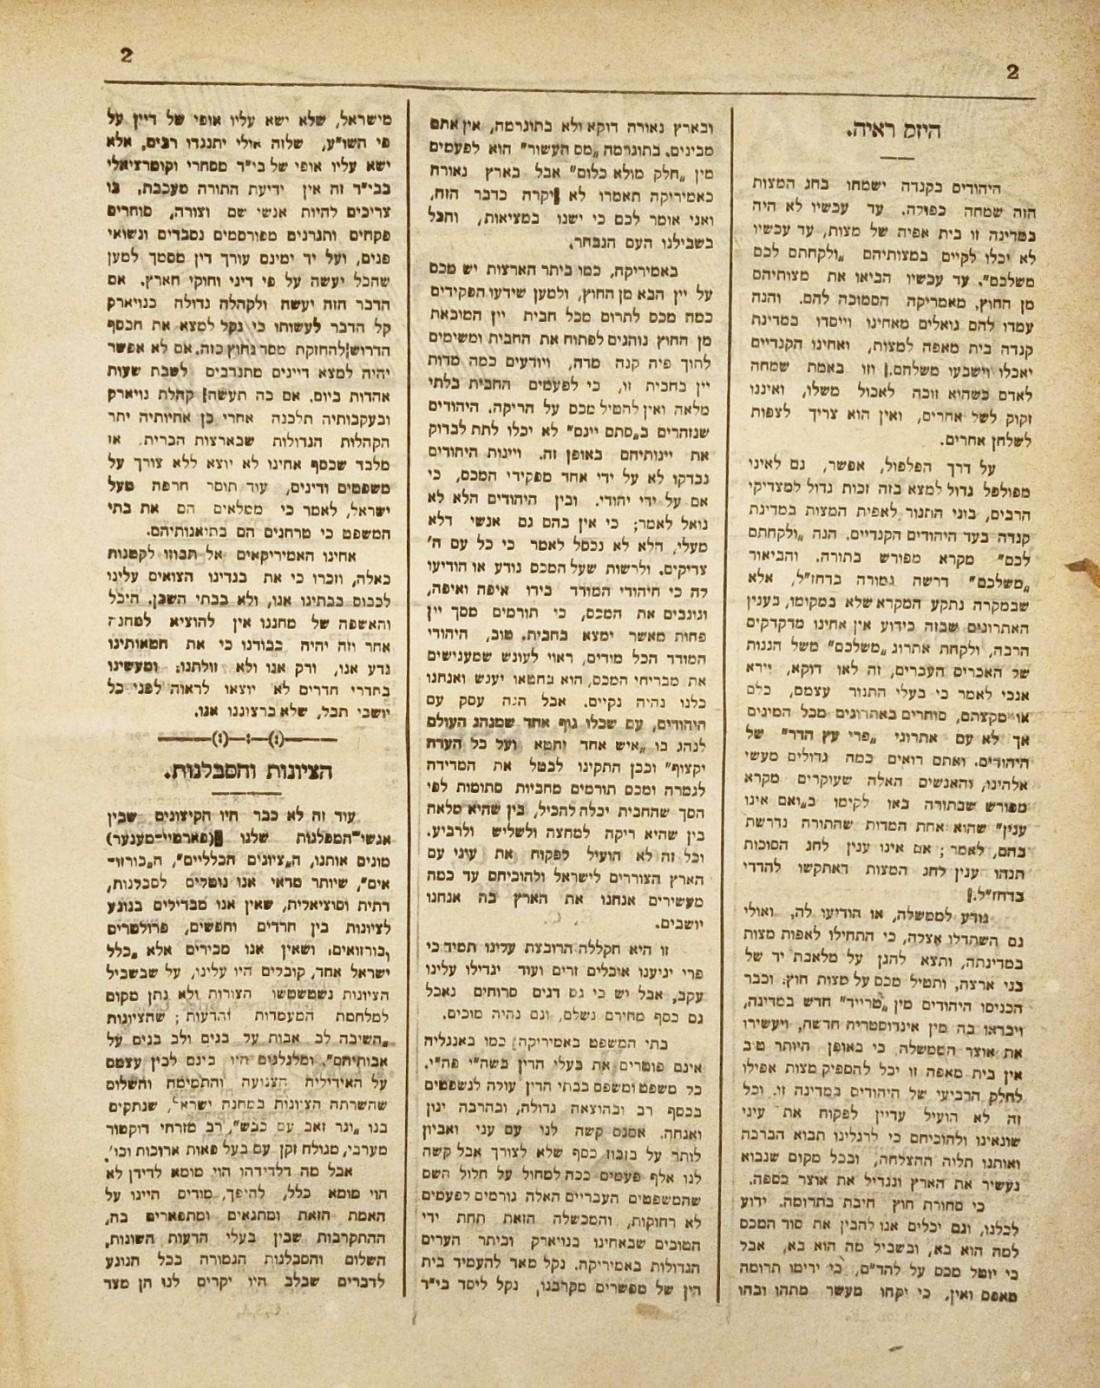 9v Yehoodi 2